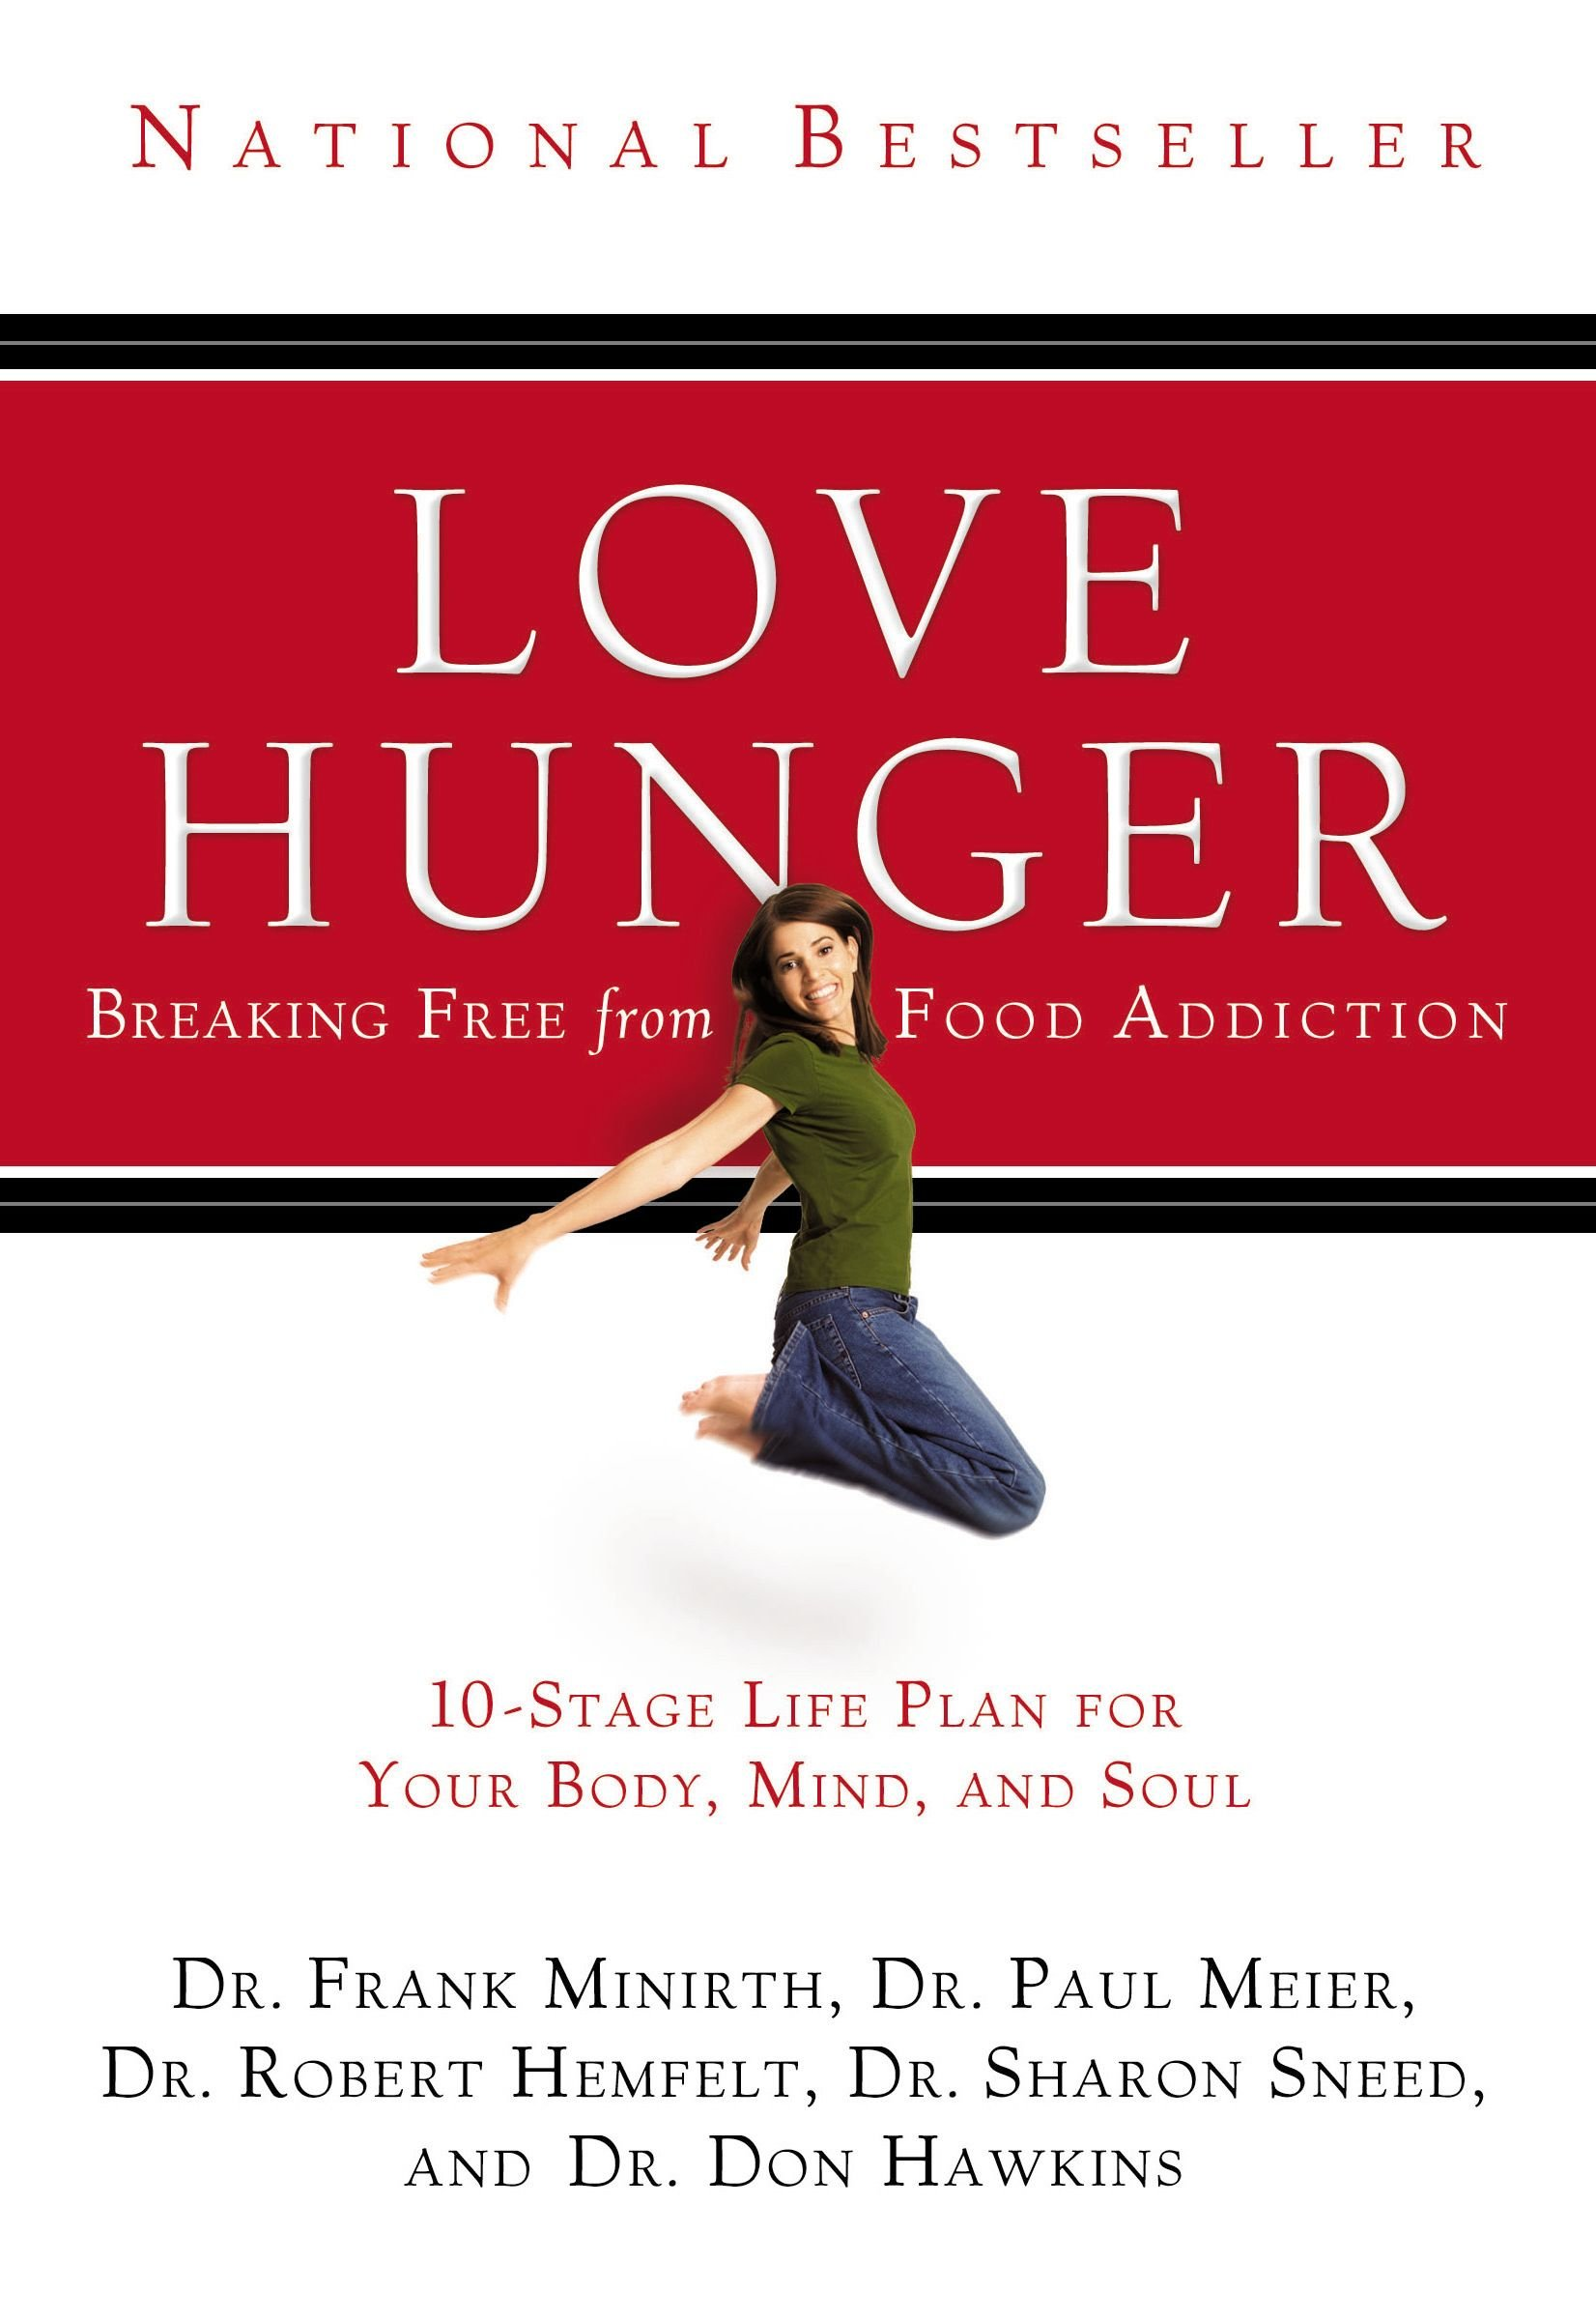 Love Hunger: Frank Minirth, Paul Meier, Robert Hemfelt, Sharon Sneed, Don  Hawkins: 0020049055717: Amazon.com: Books